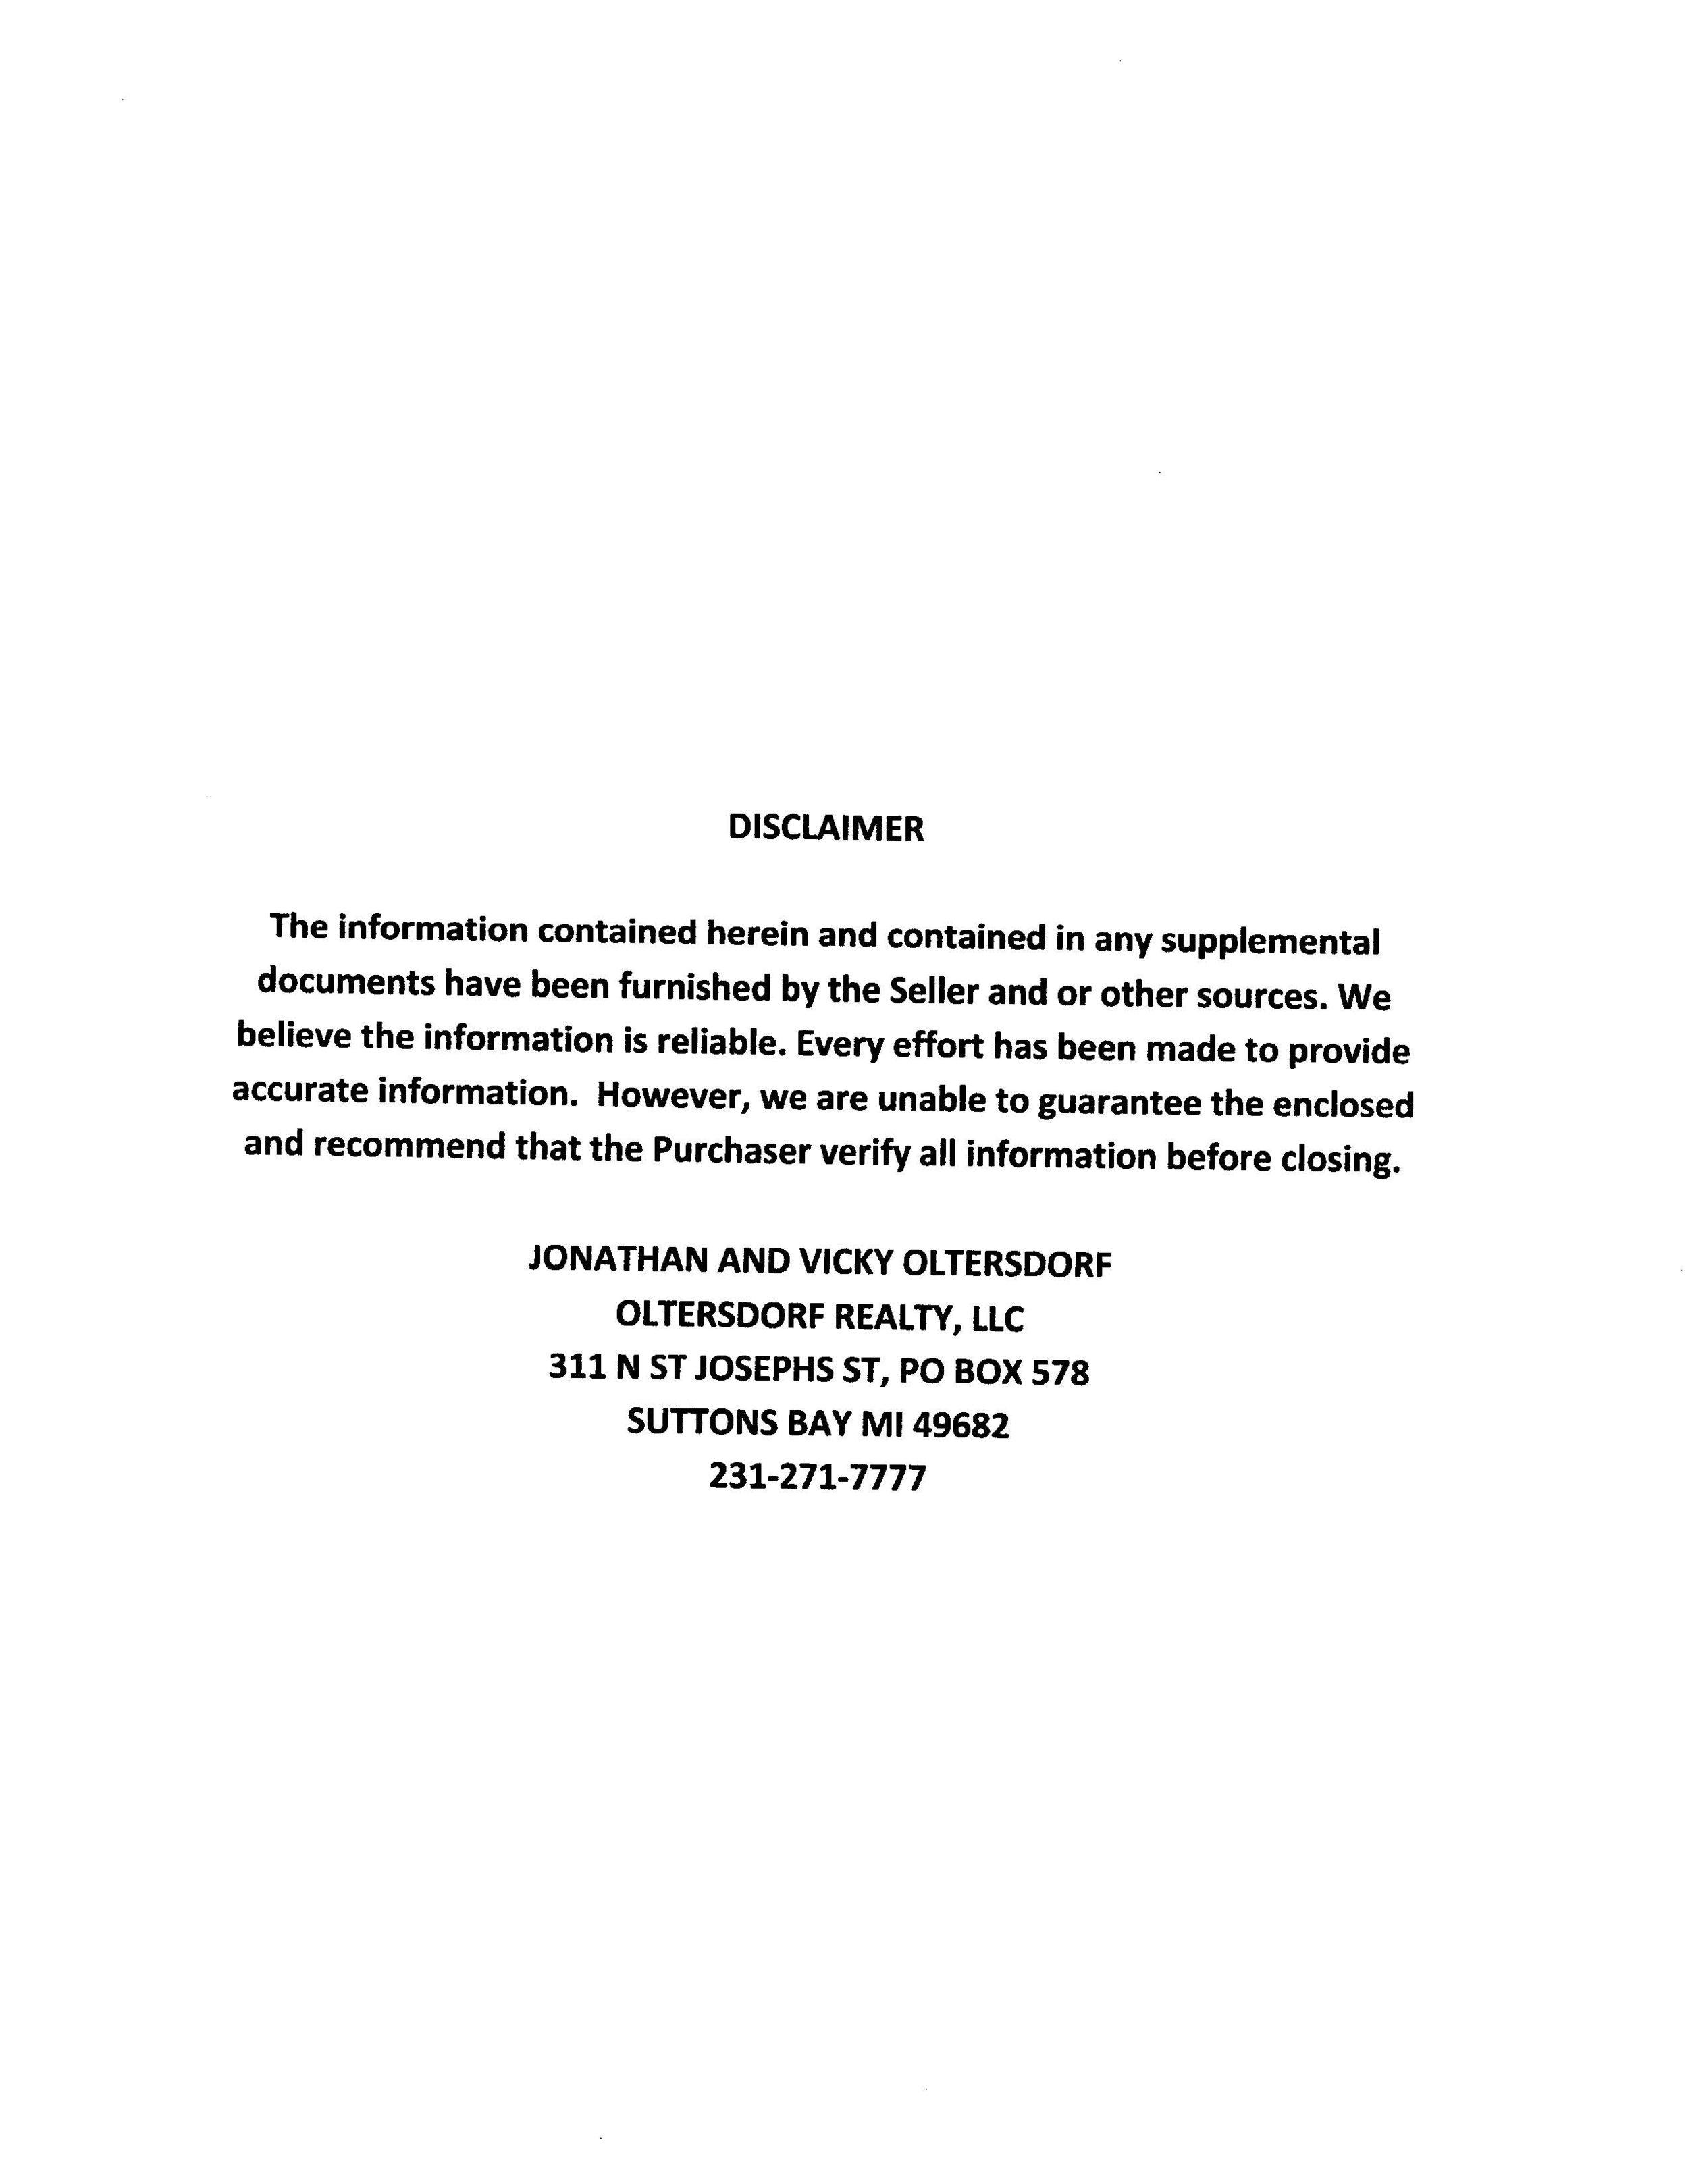 224 W Eighth St, Traverse City, MI – Downtown Traverse City Triplex Marketing Packet - For sale by Oltersdorf Realty LLC (22).jpg